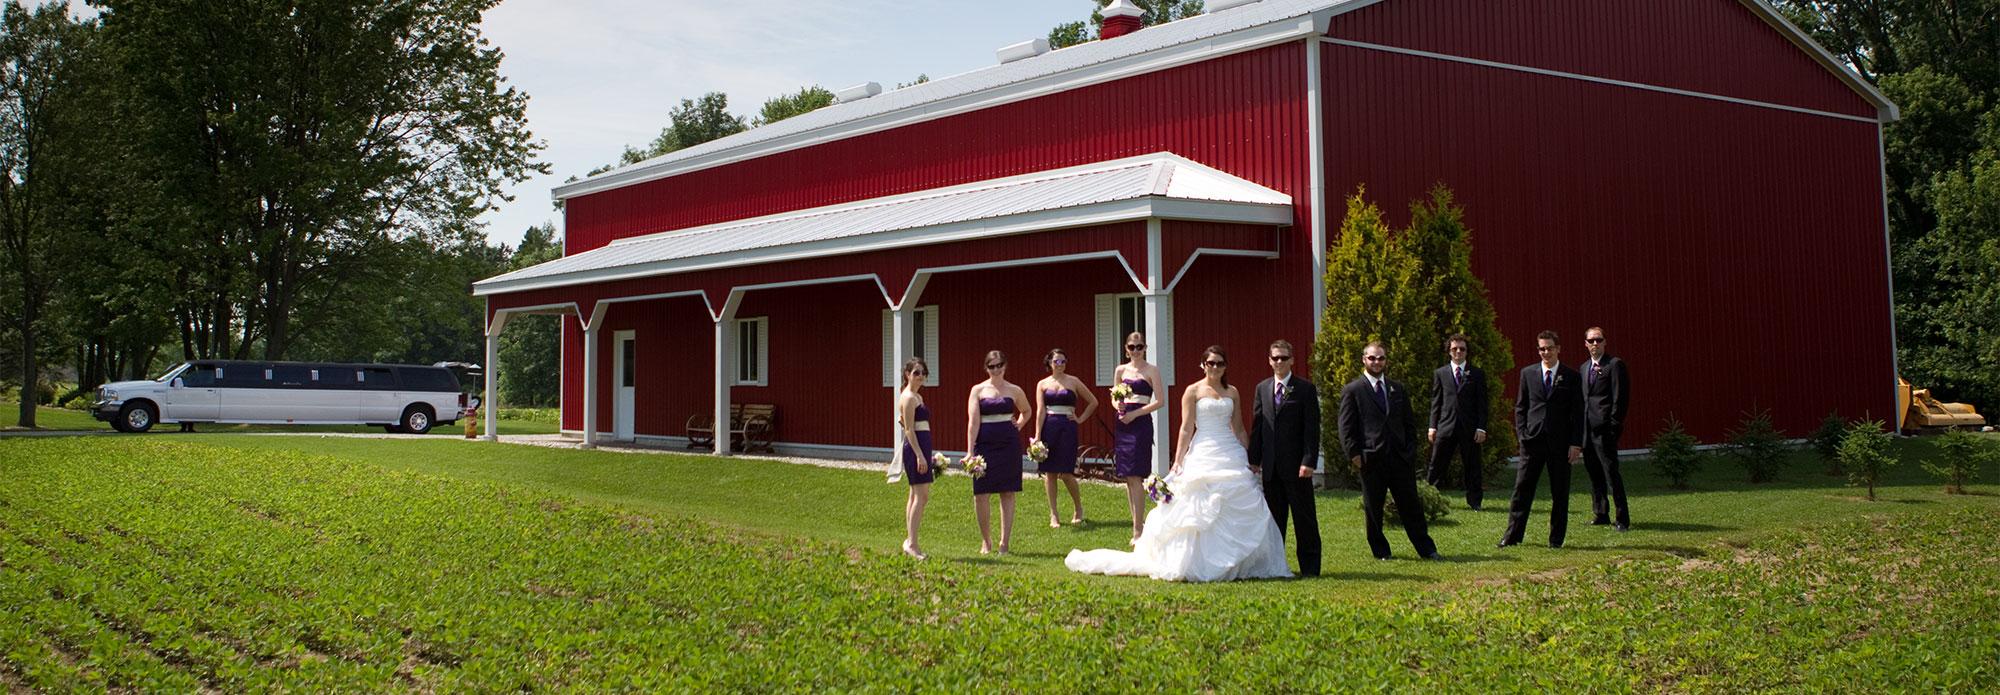 Wedding limbusine and red barn